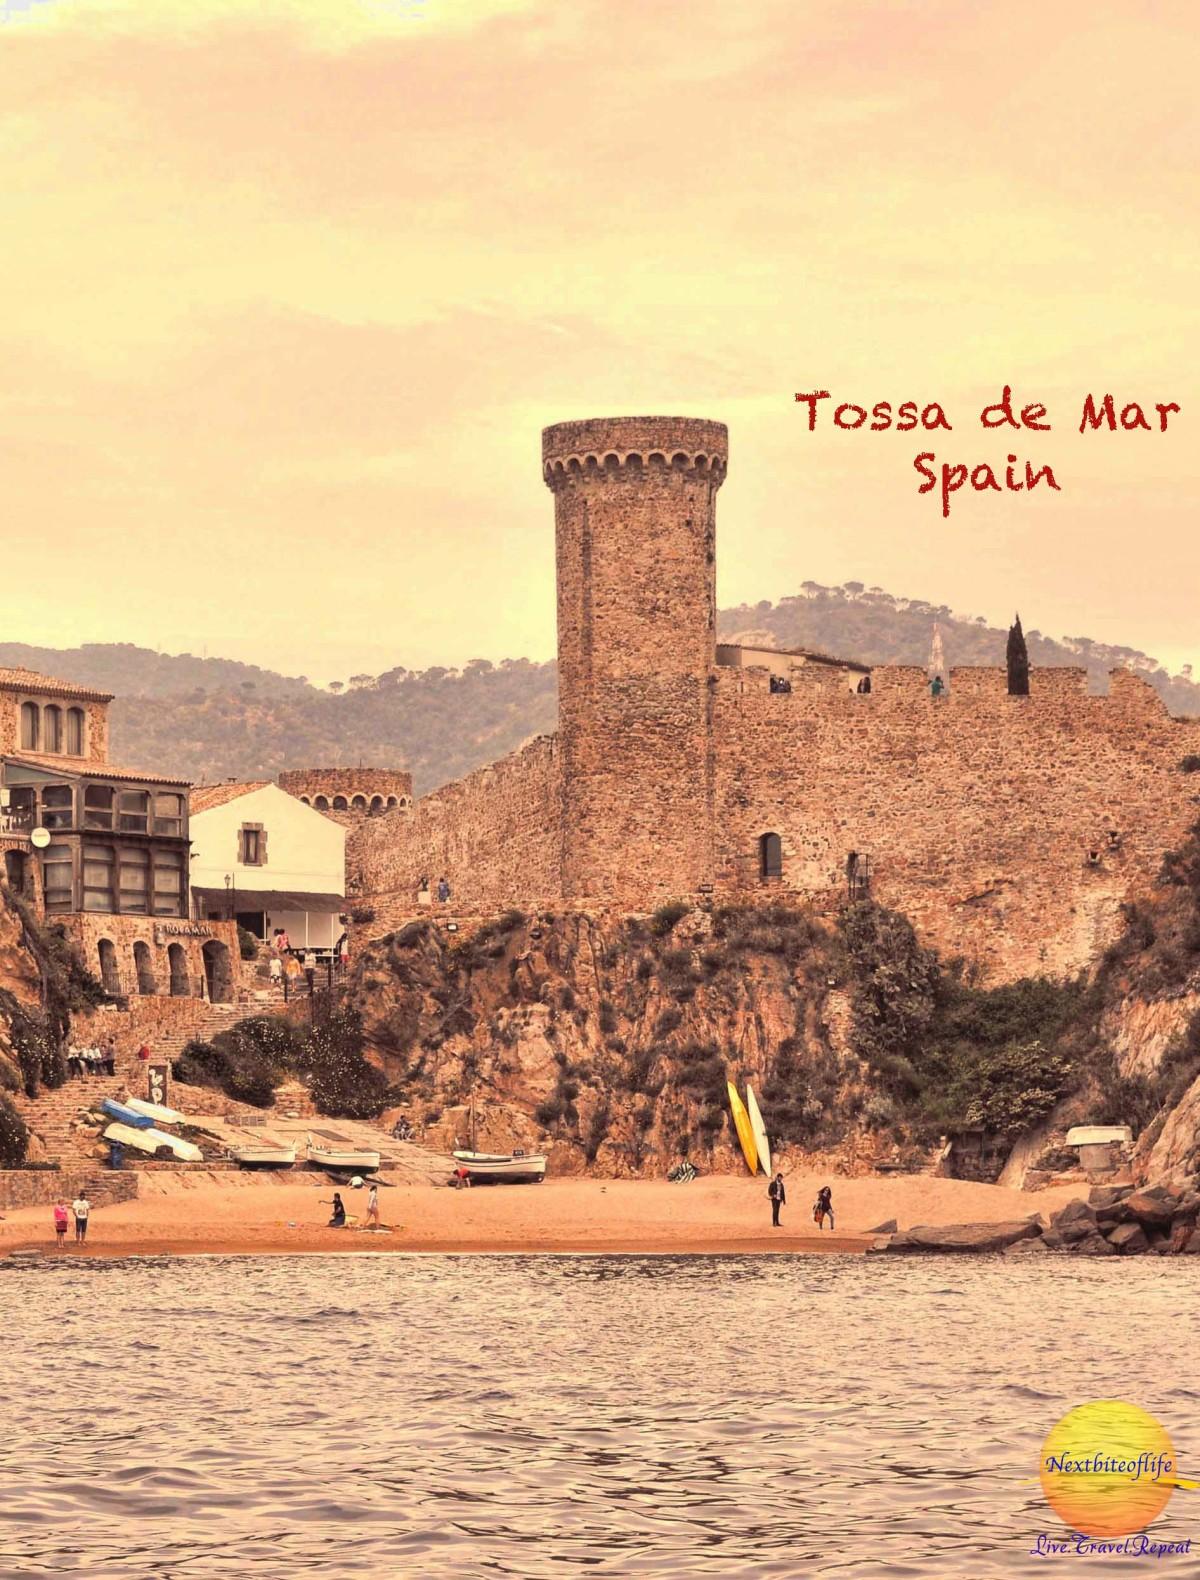 Tossa de Mar - pin it for later access.